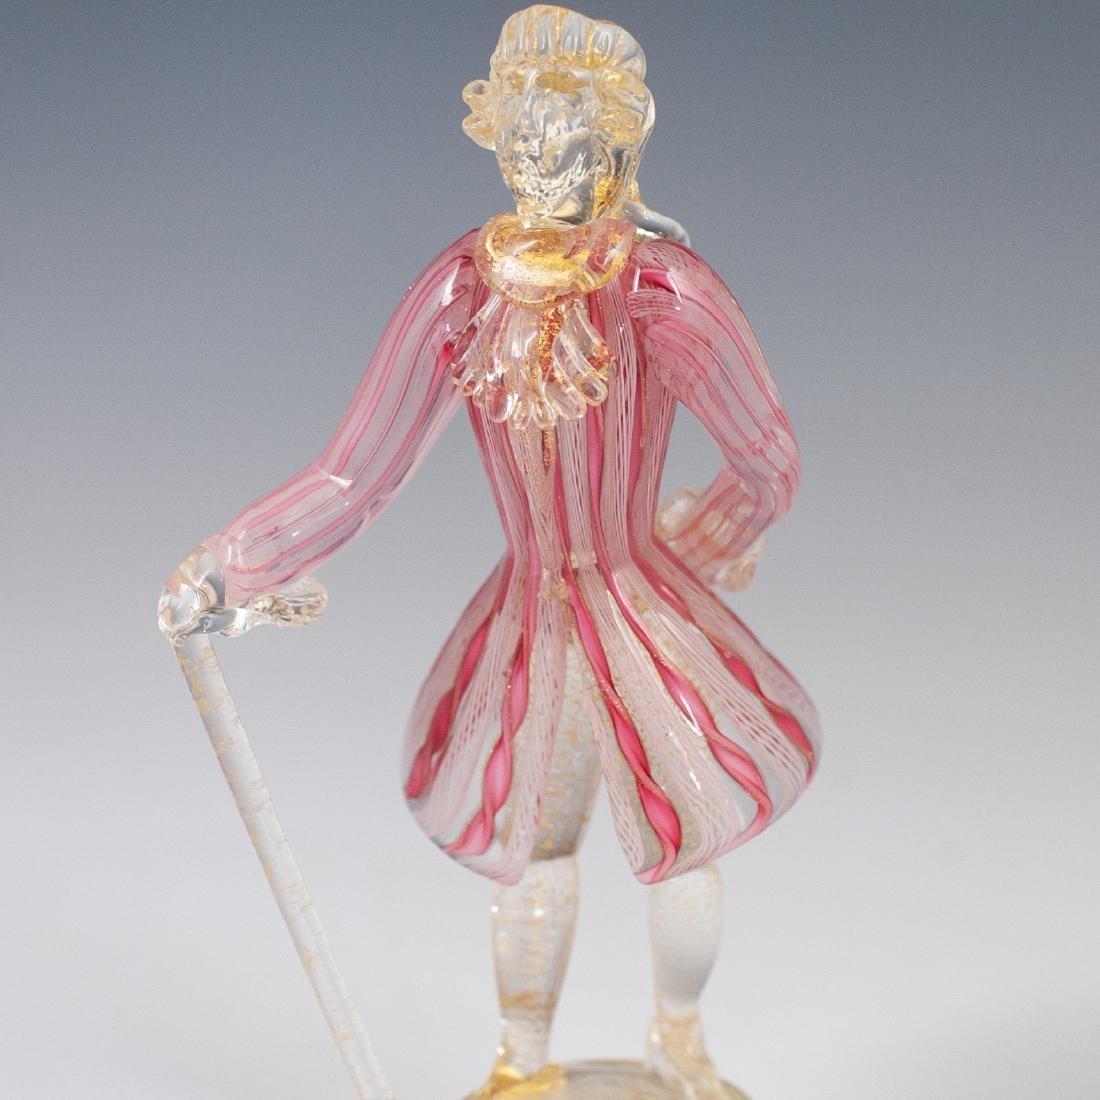 Murano Glass Figurines - 4